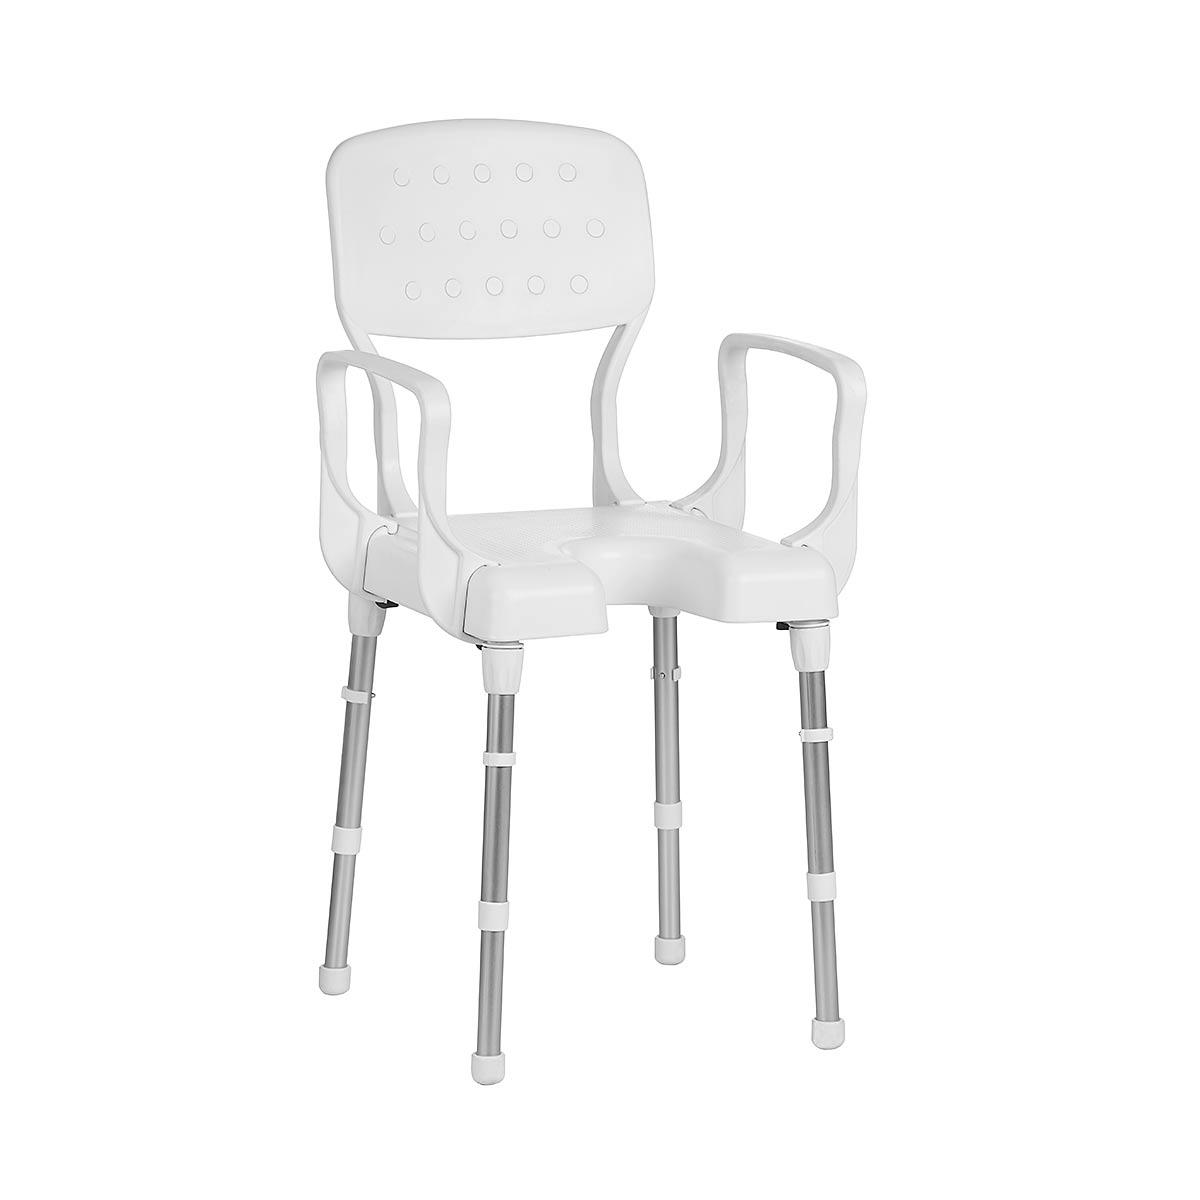 Rebotec Nizza – Shower Chair